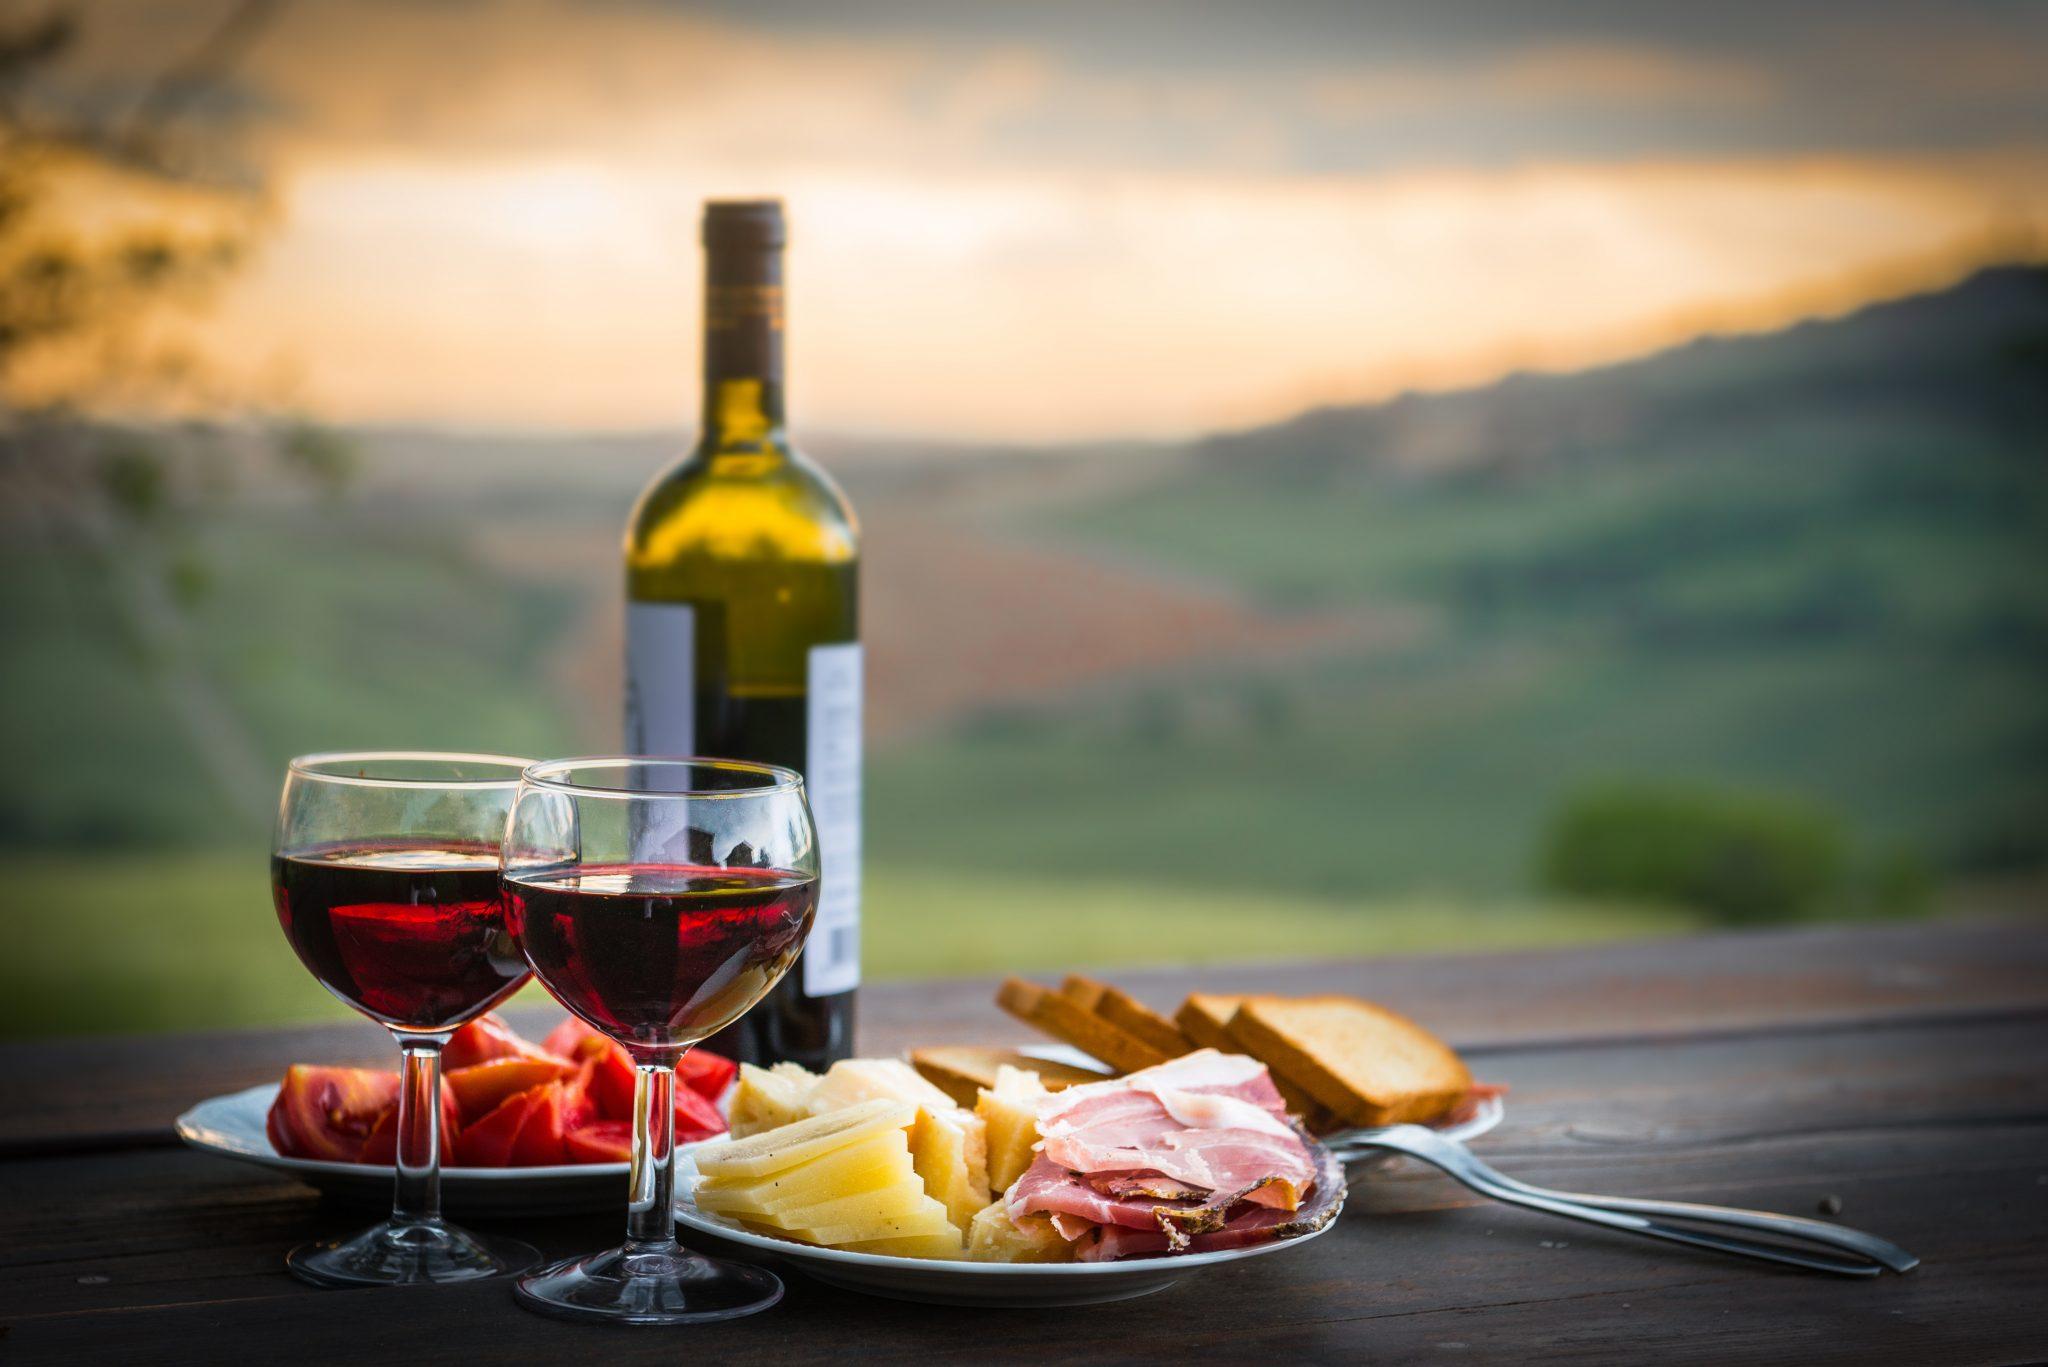 Picnic Chic vigna enoturismo vino